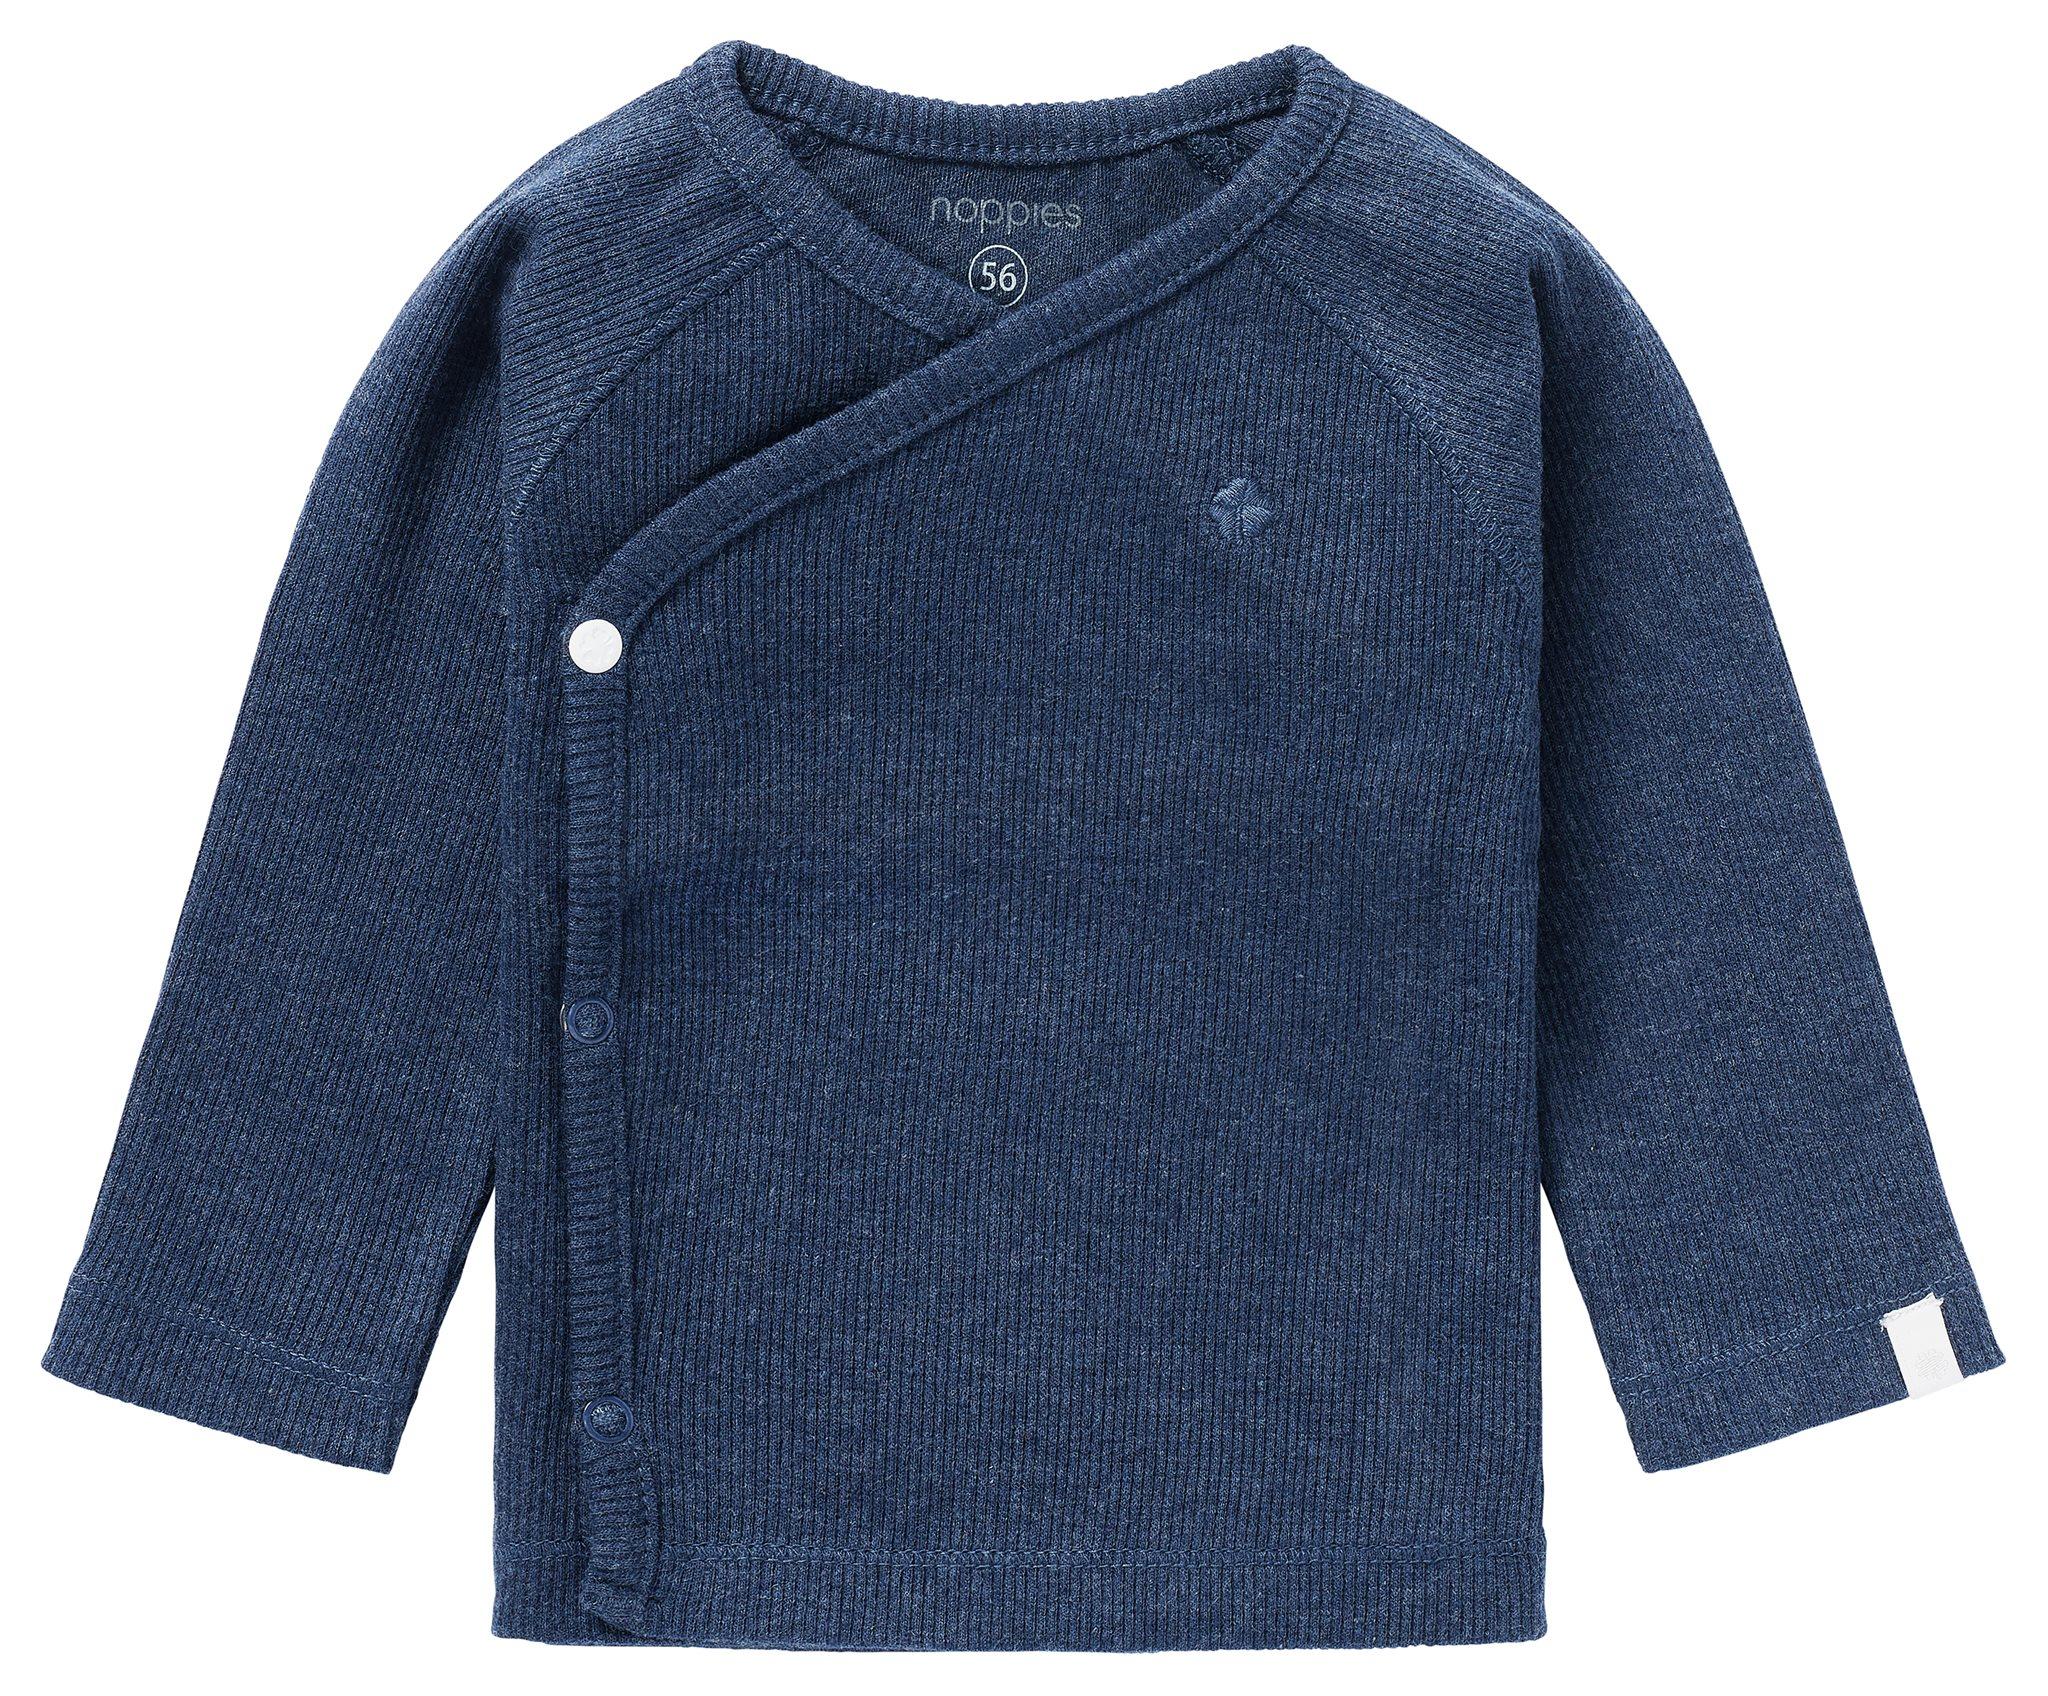 Noppies vest Nanyuki